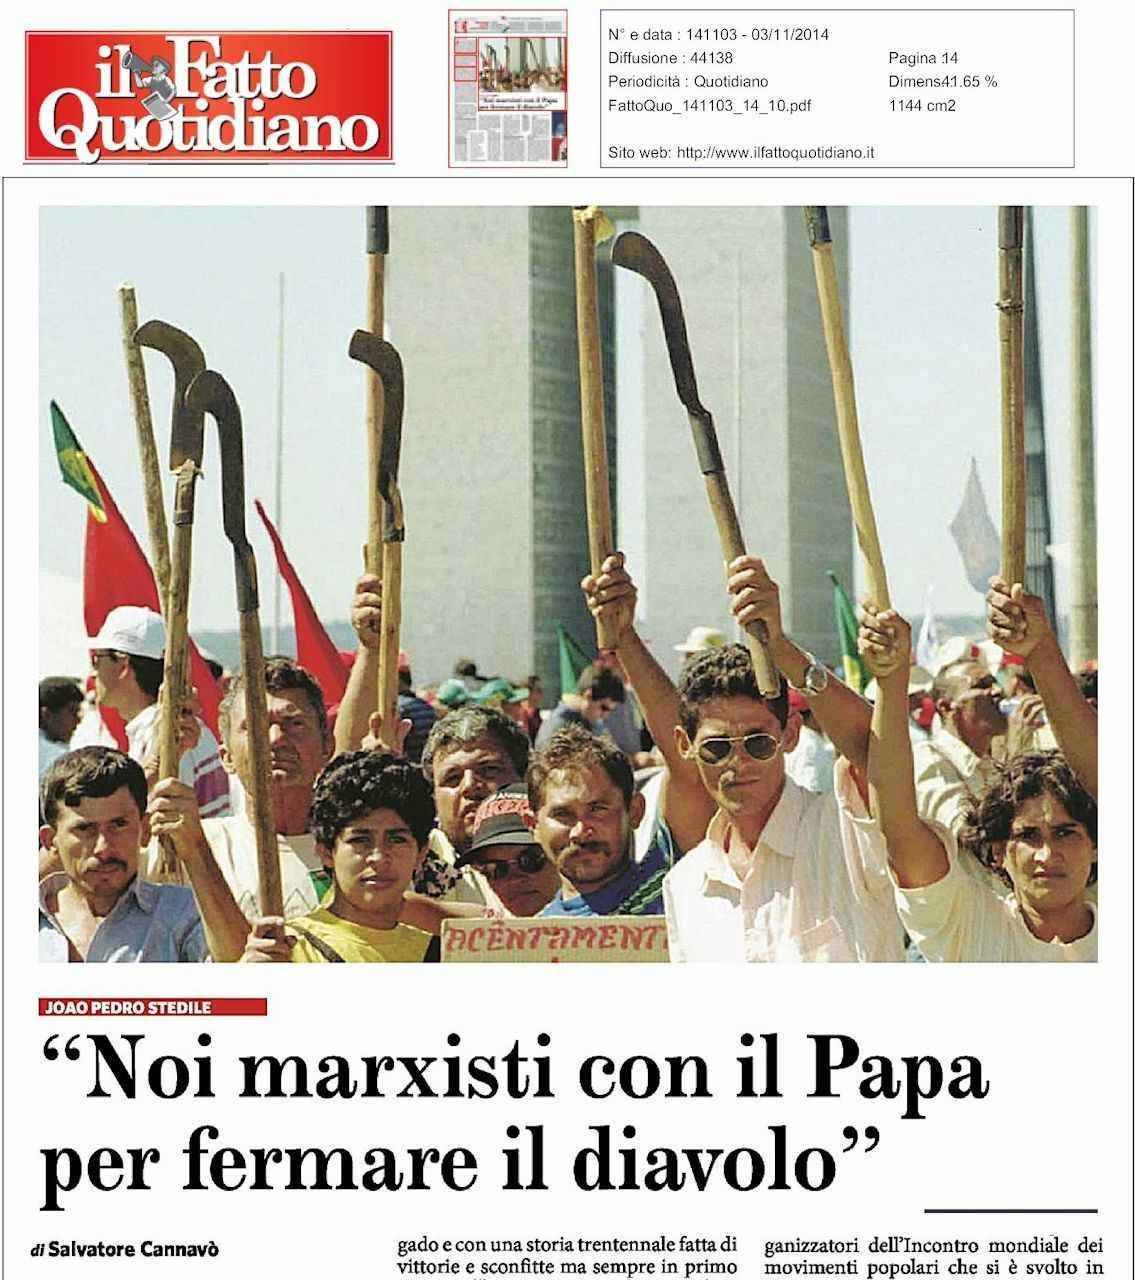 """Nós marxistas com o Papa para parar o diabo"" Il Fatto Quotidiano, Roma, 3.11.2014"